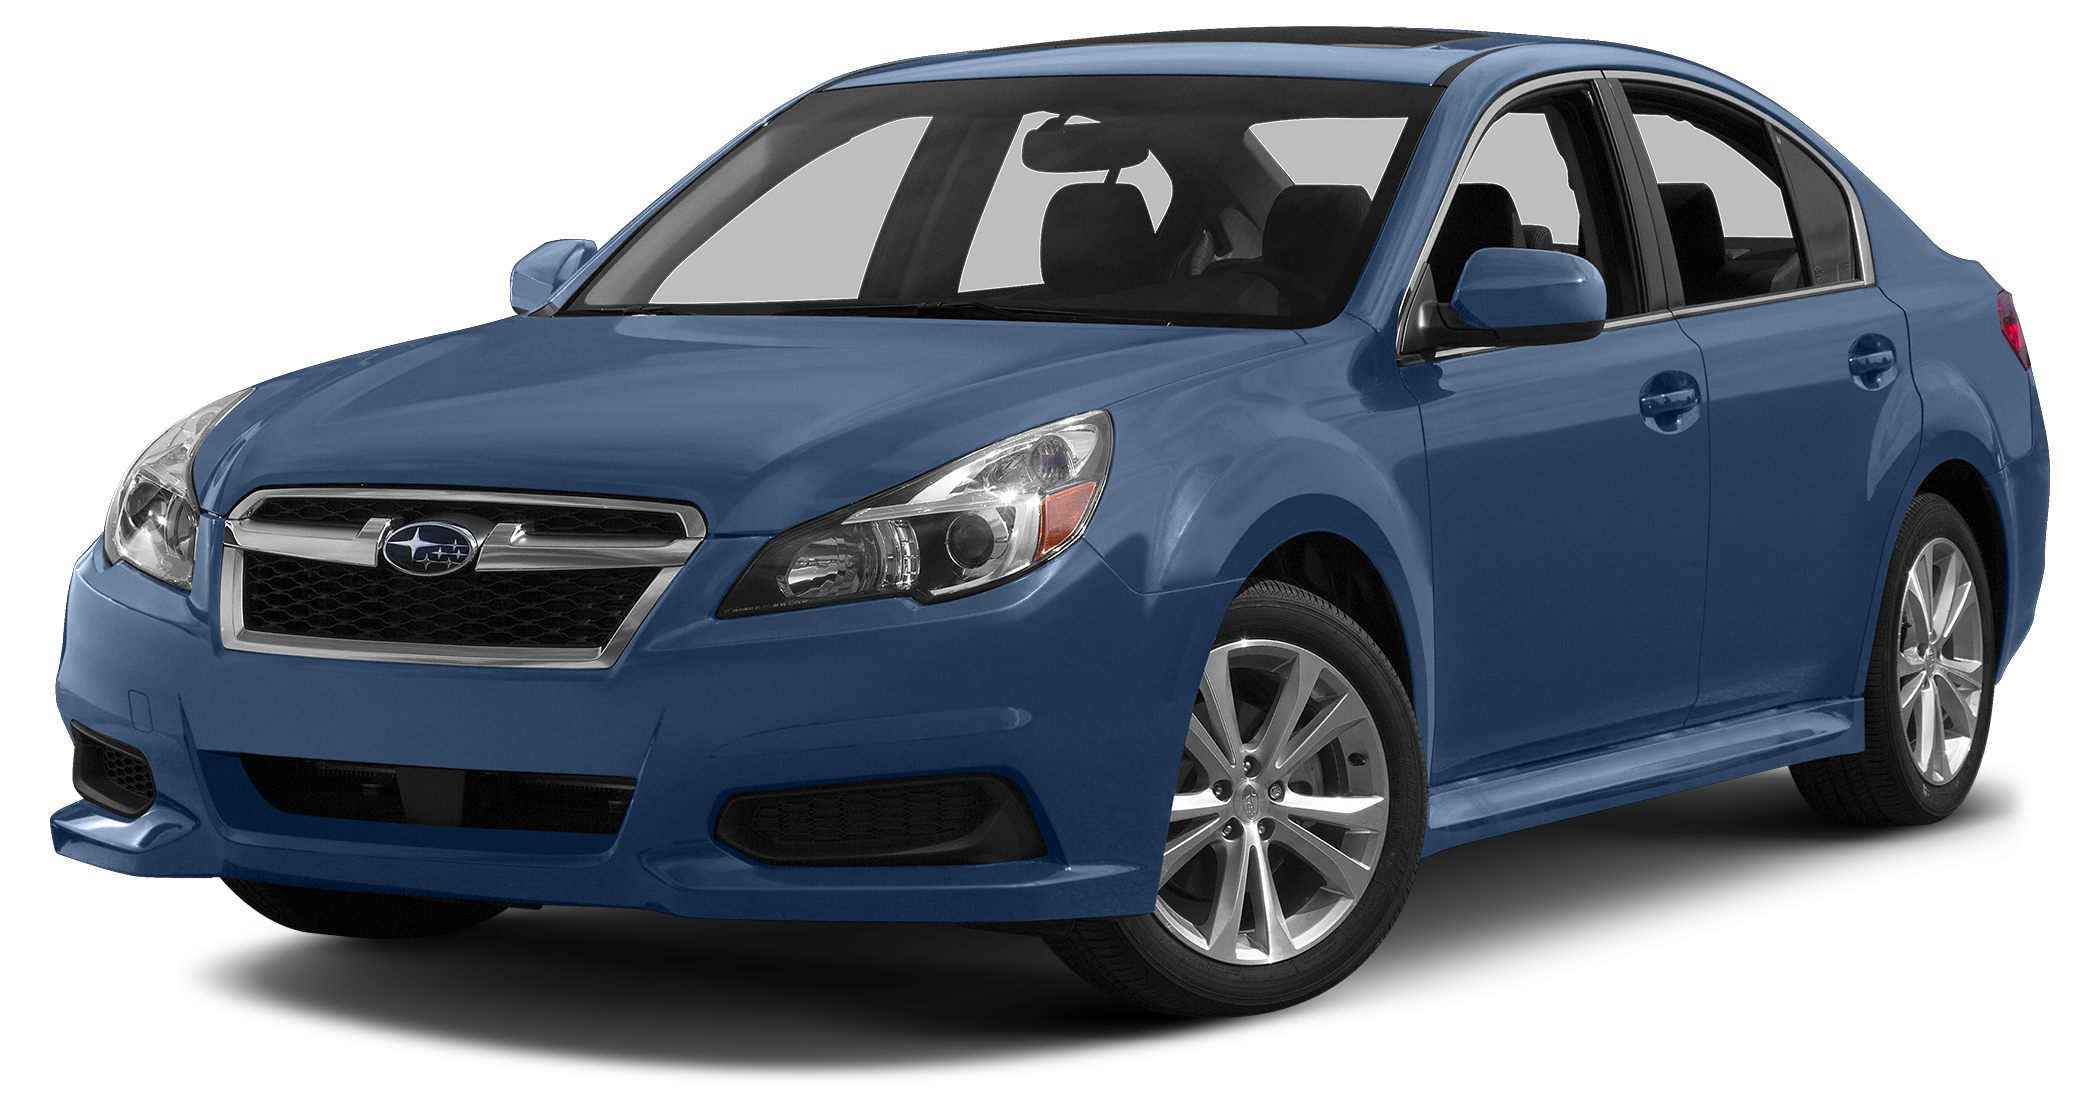 2014 Subaru Legacy 25i Premium  ONE PRICE STOP NO HASSLE NO HAGGLE CAR BUYING EXPERIENCE